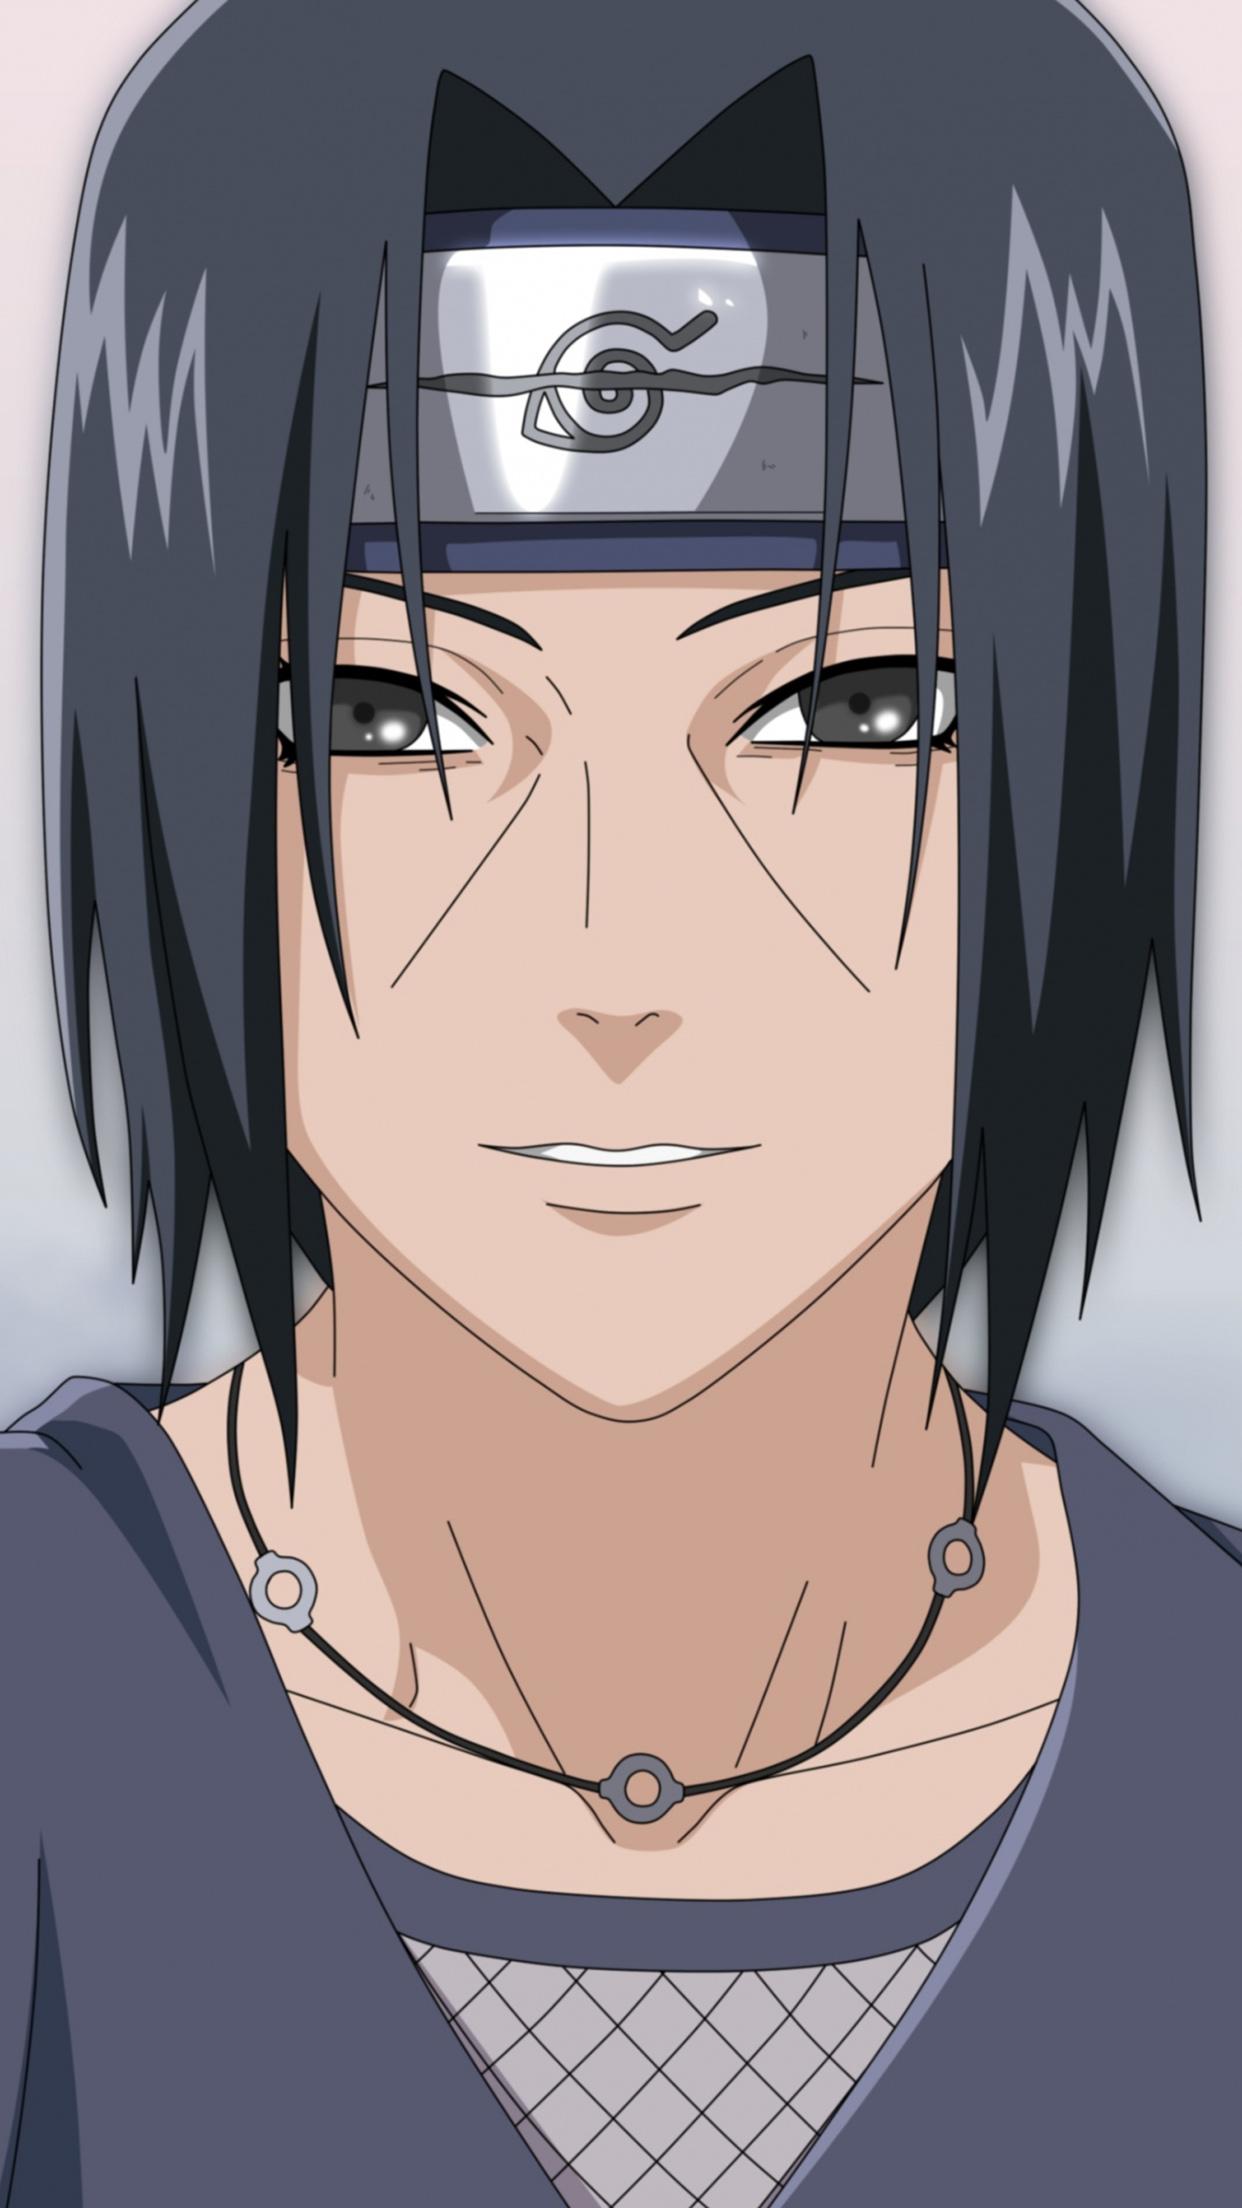 Naruto Naruto 1 3Wallpapers iPhone Parallax Naruto 1